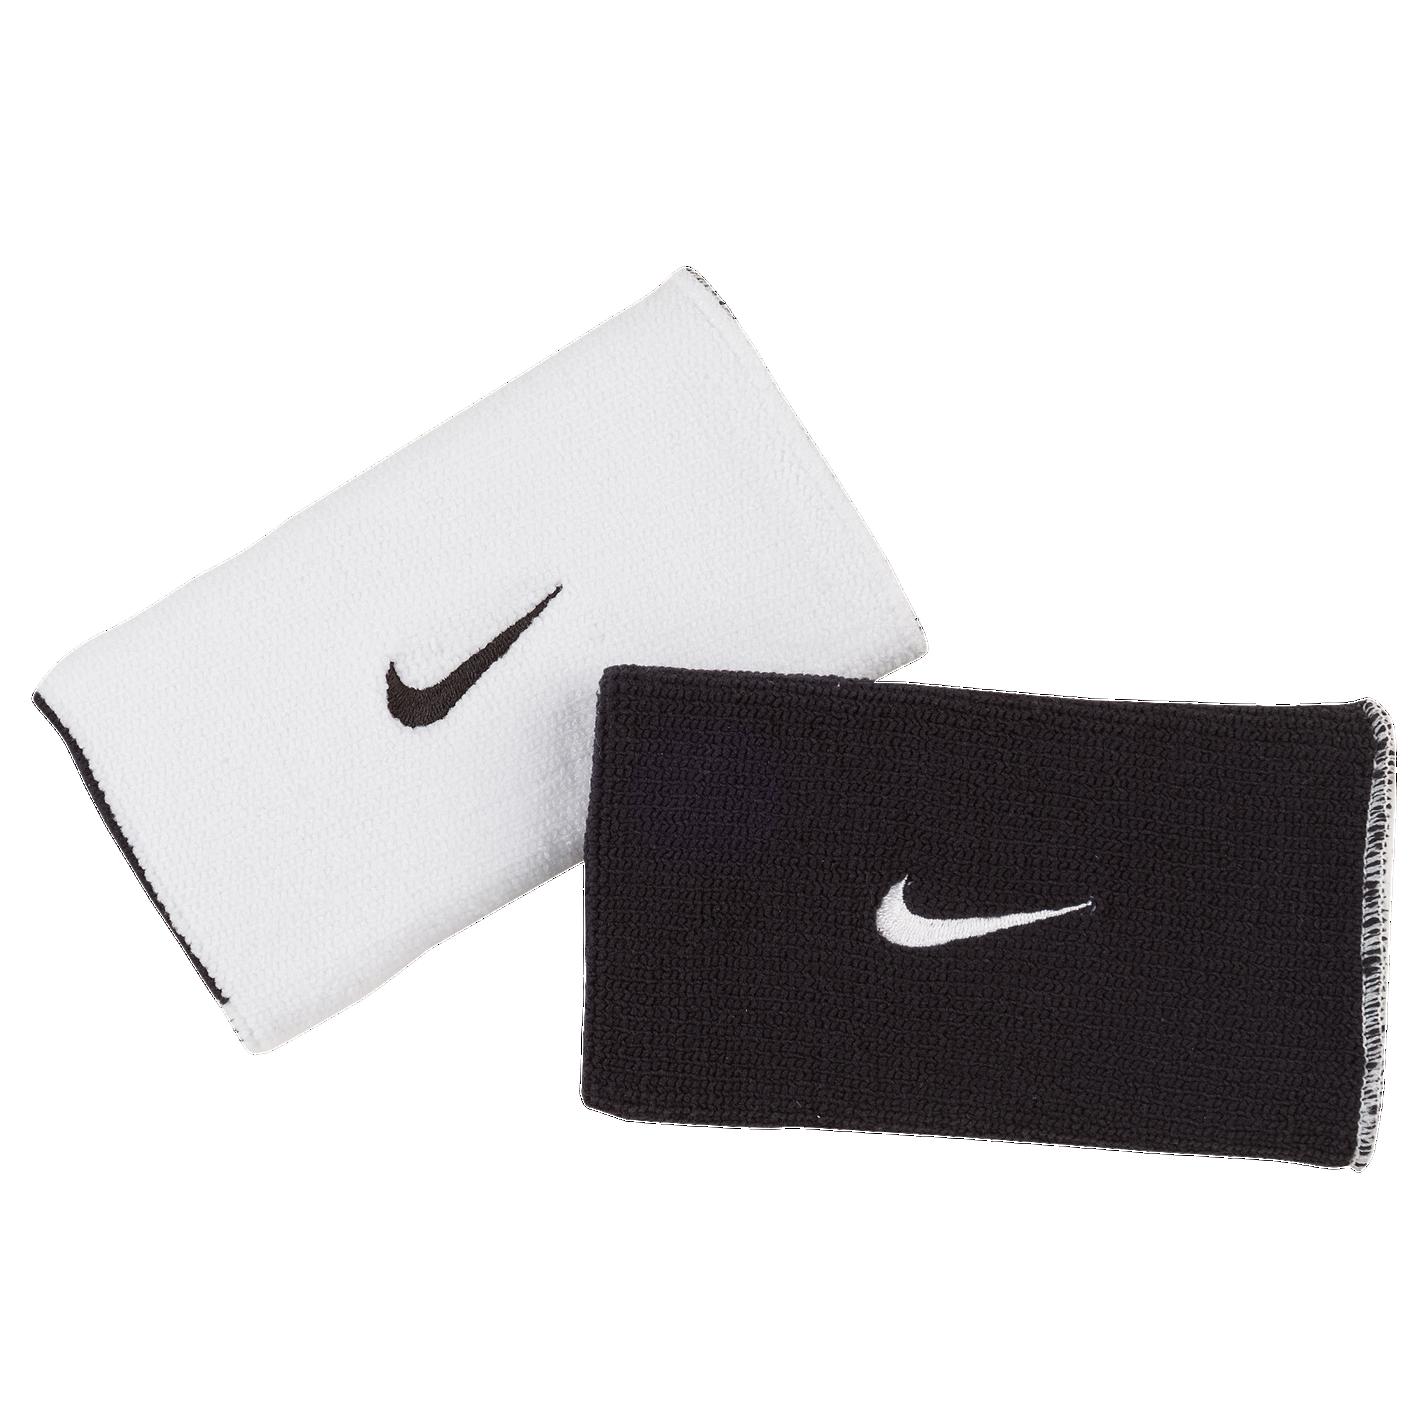 buy popular 59672 1fb36 Nike Dri-Fit Home   Away Doublewide Wristbands - Men s